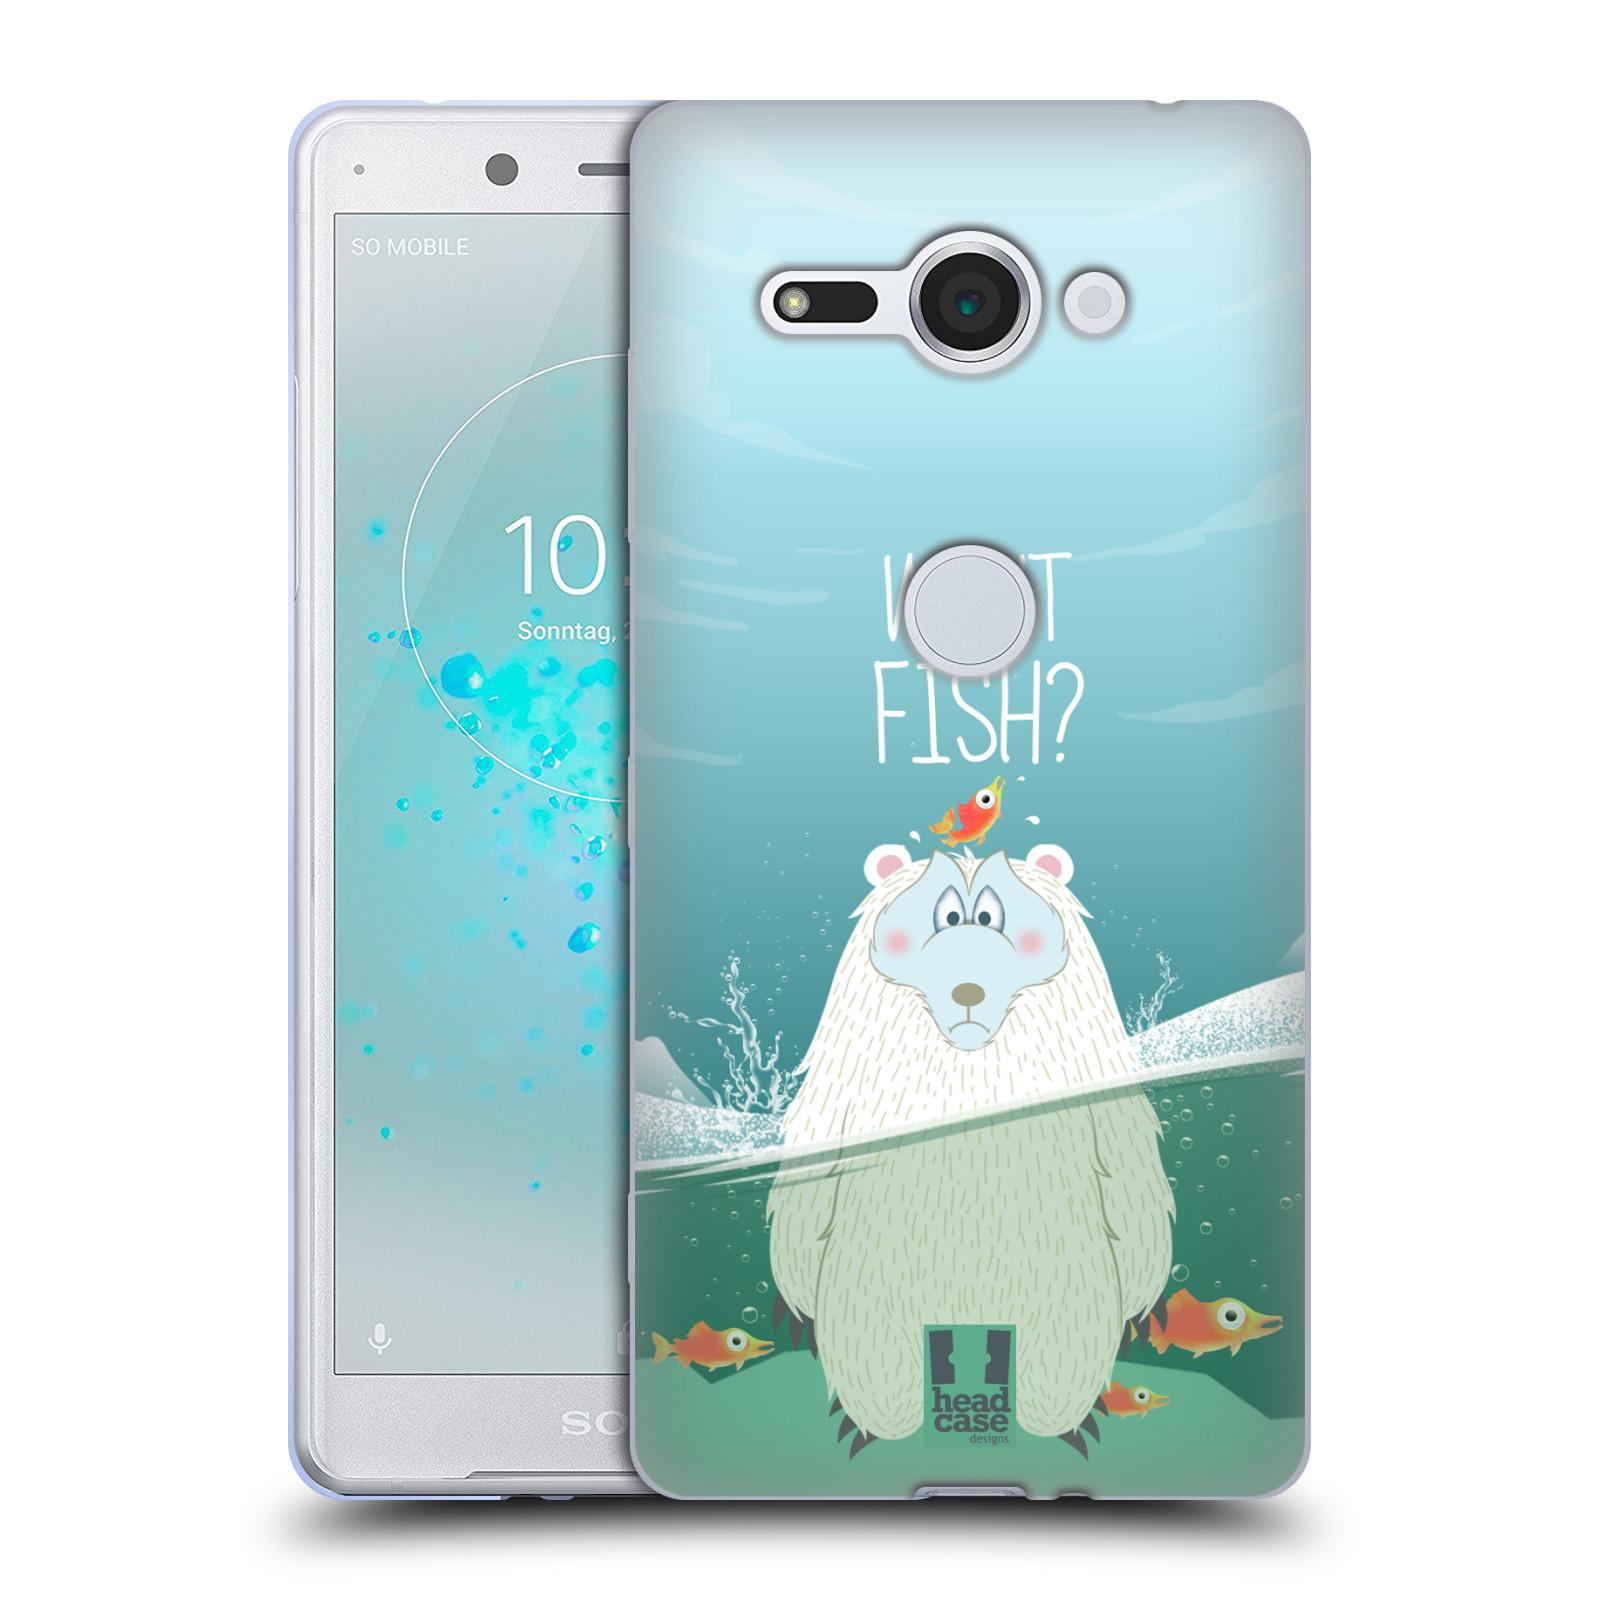 Silikonové pouzdro na mobil Sony Xperia XZ2 Compact - Head Case - Medvěd Whut Fish?